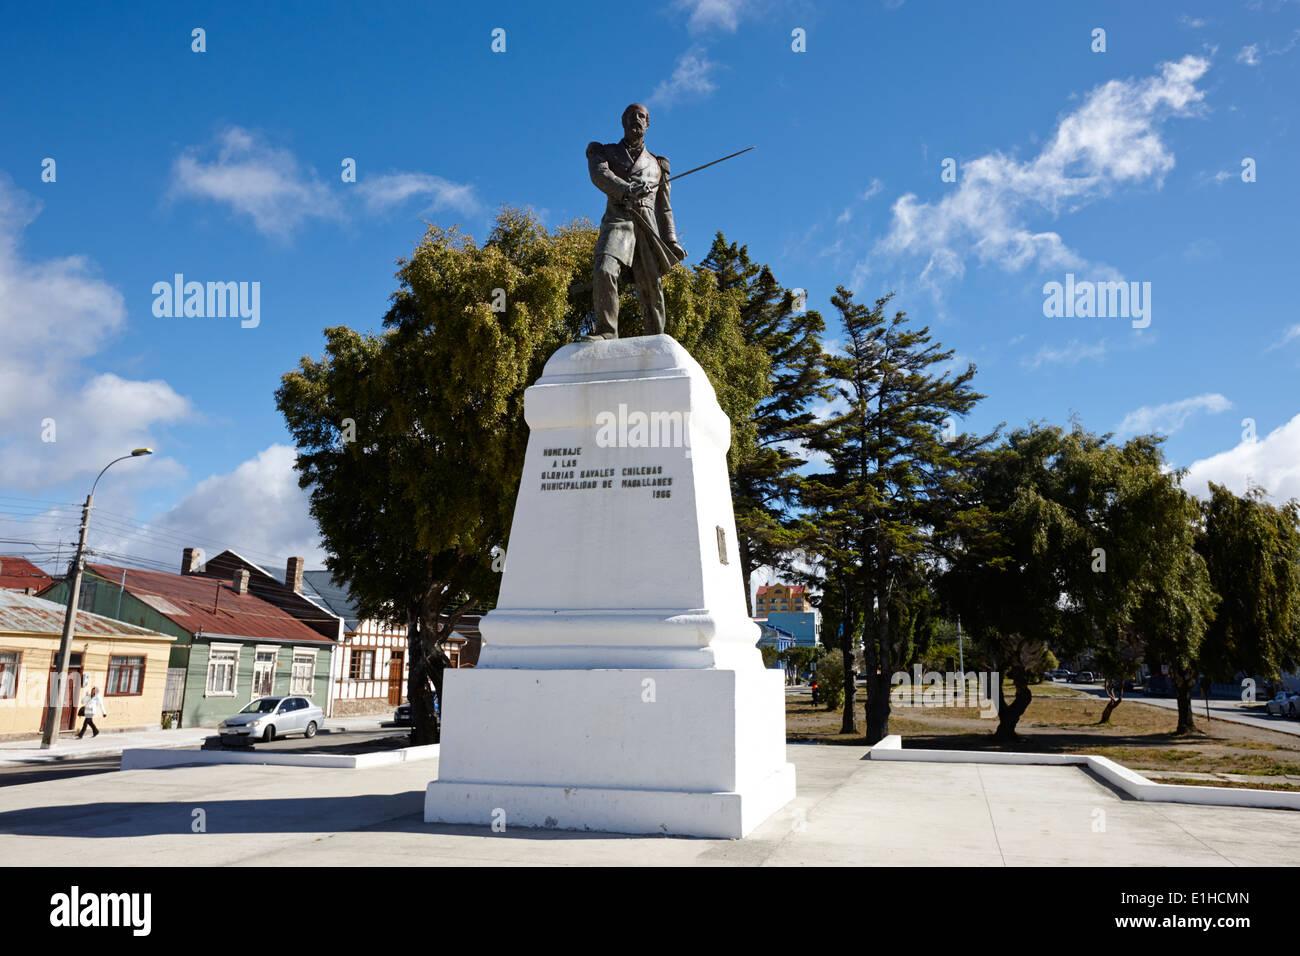 arturo prat monument memorial av colon Punta Arenas Chile - Stock Image